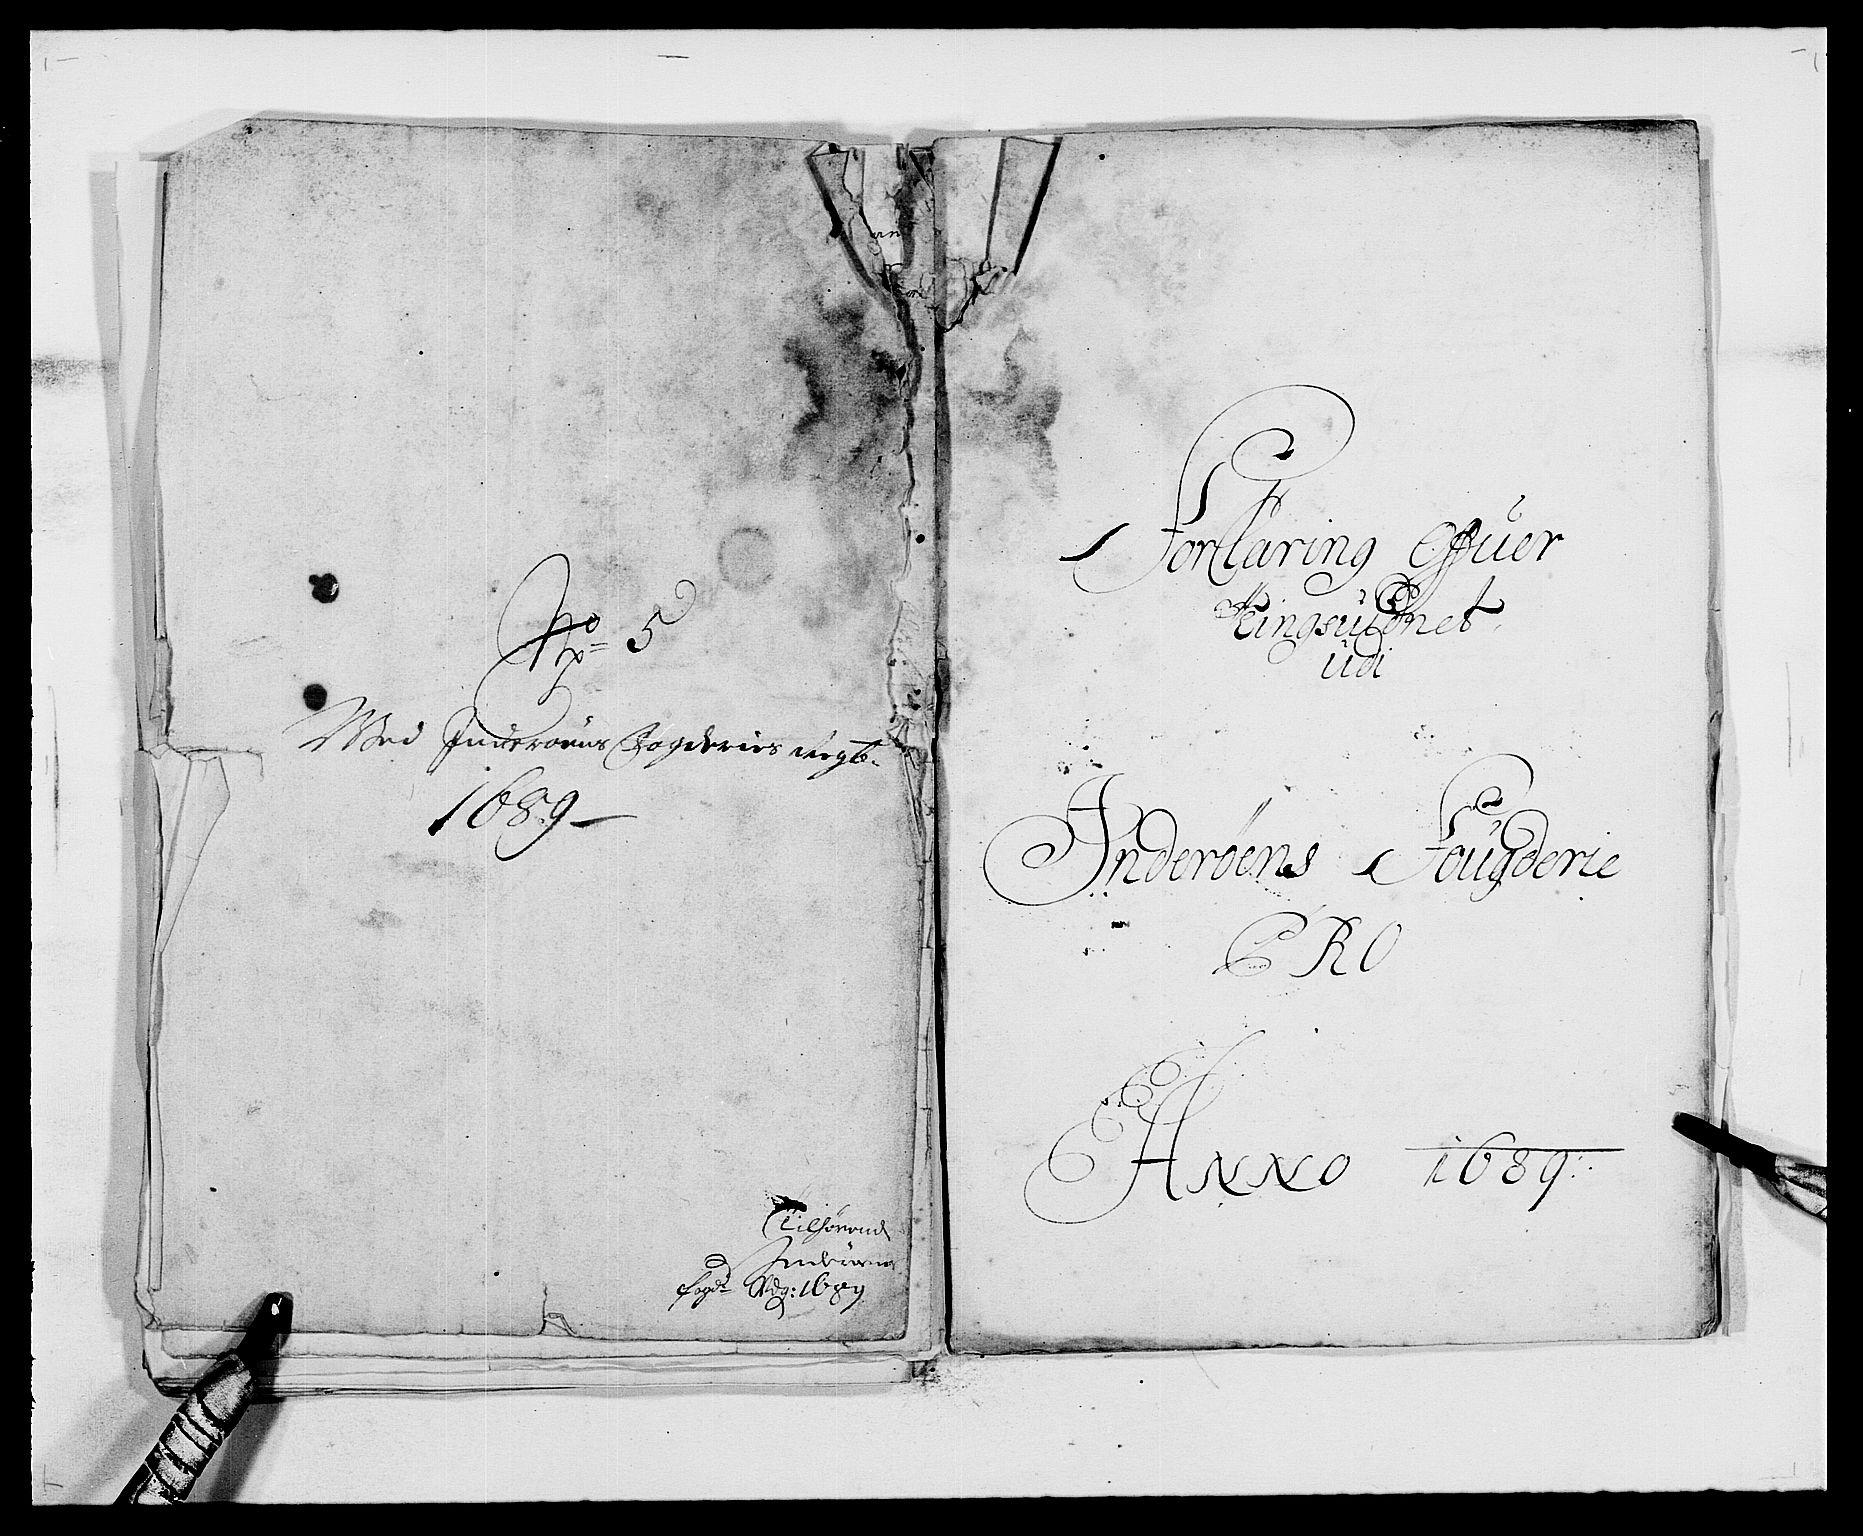 RA, Rentekammeret inntil 1814, Reviderte regnskaper, Fogderegnskap, R63/L4306: Fogderegnskap Inderøy, 1687-1689, s. 514